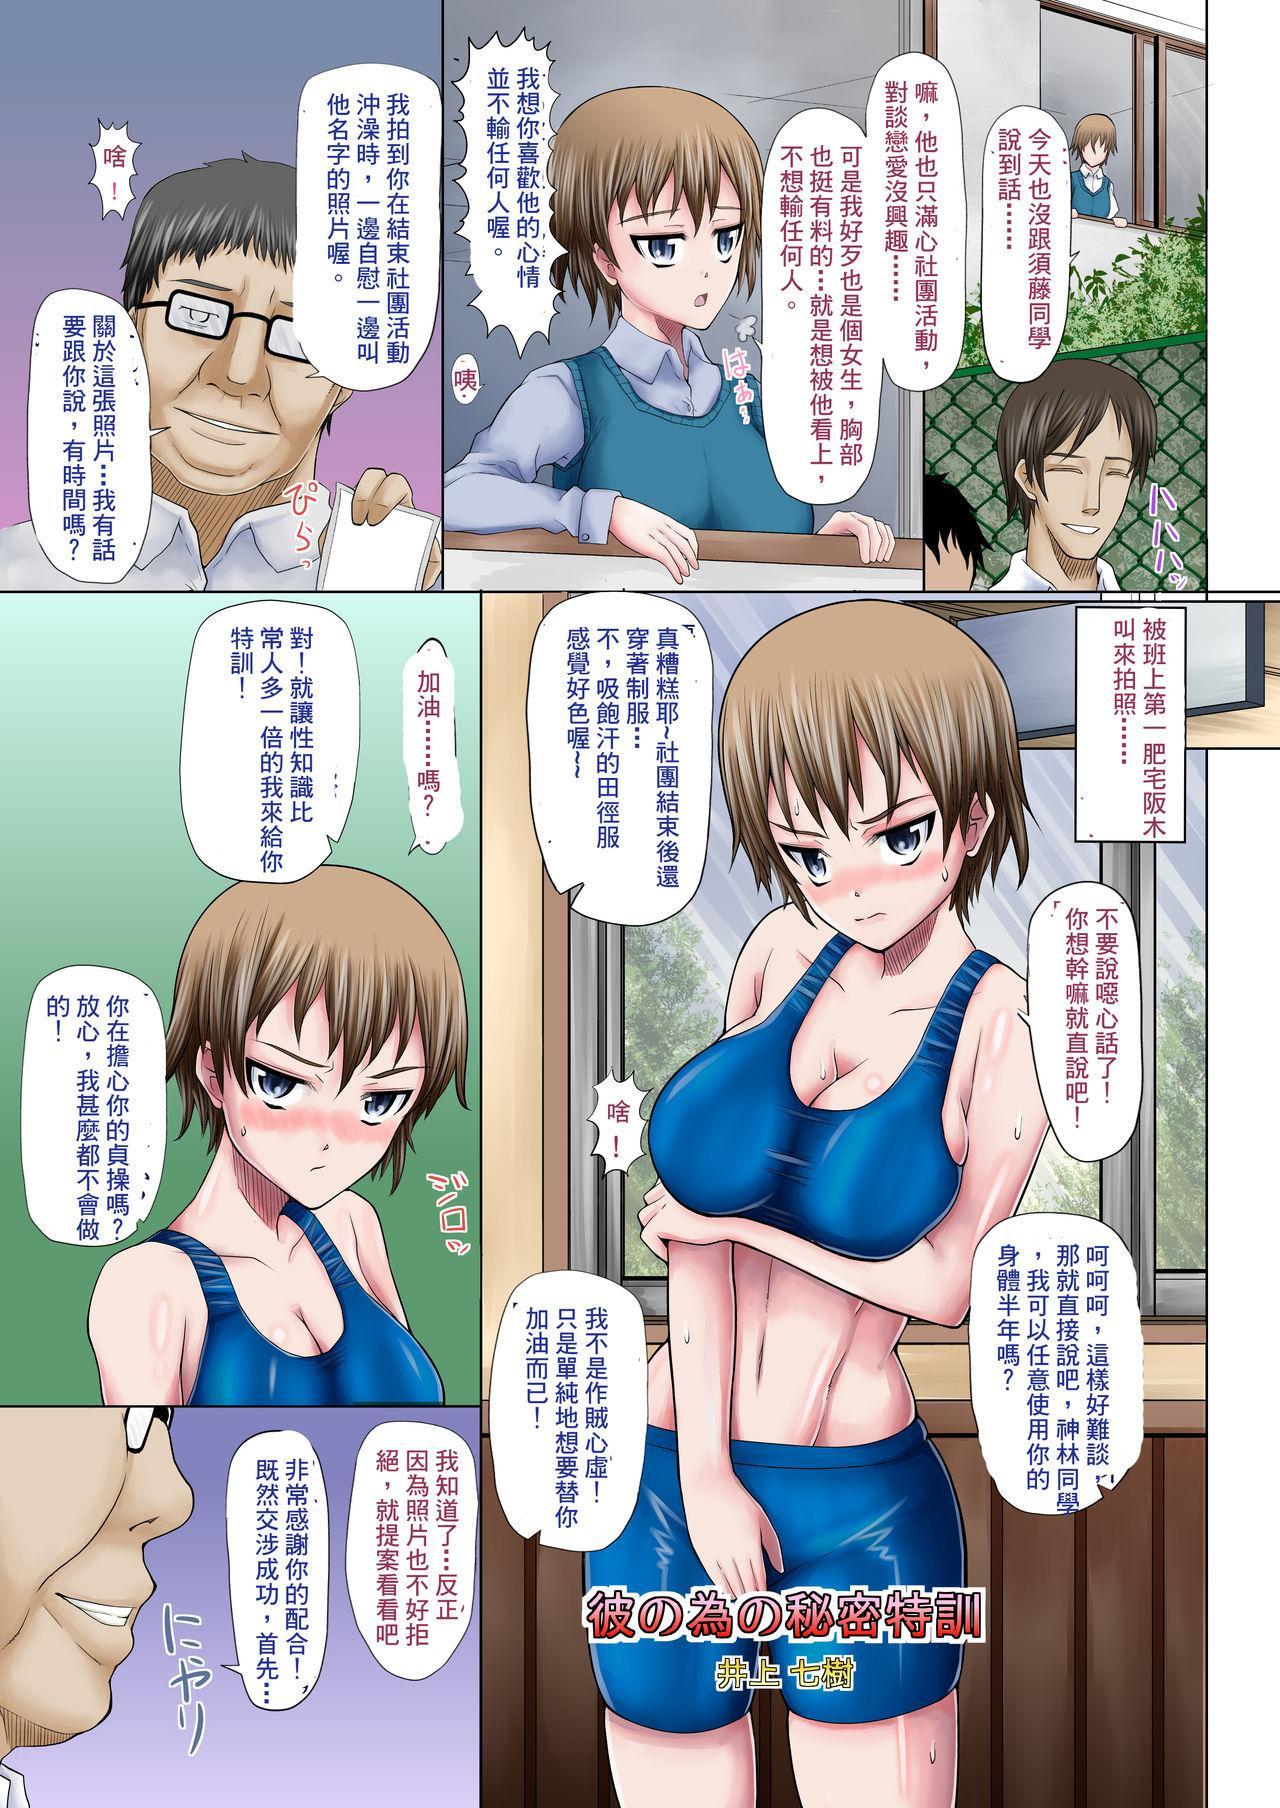 Netorare! Saimin! Kusurizuke! Kuroochi Bitch-ka Chronicle 0